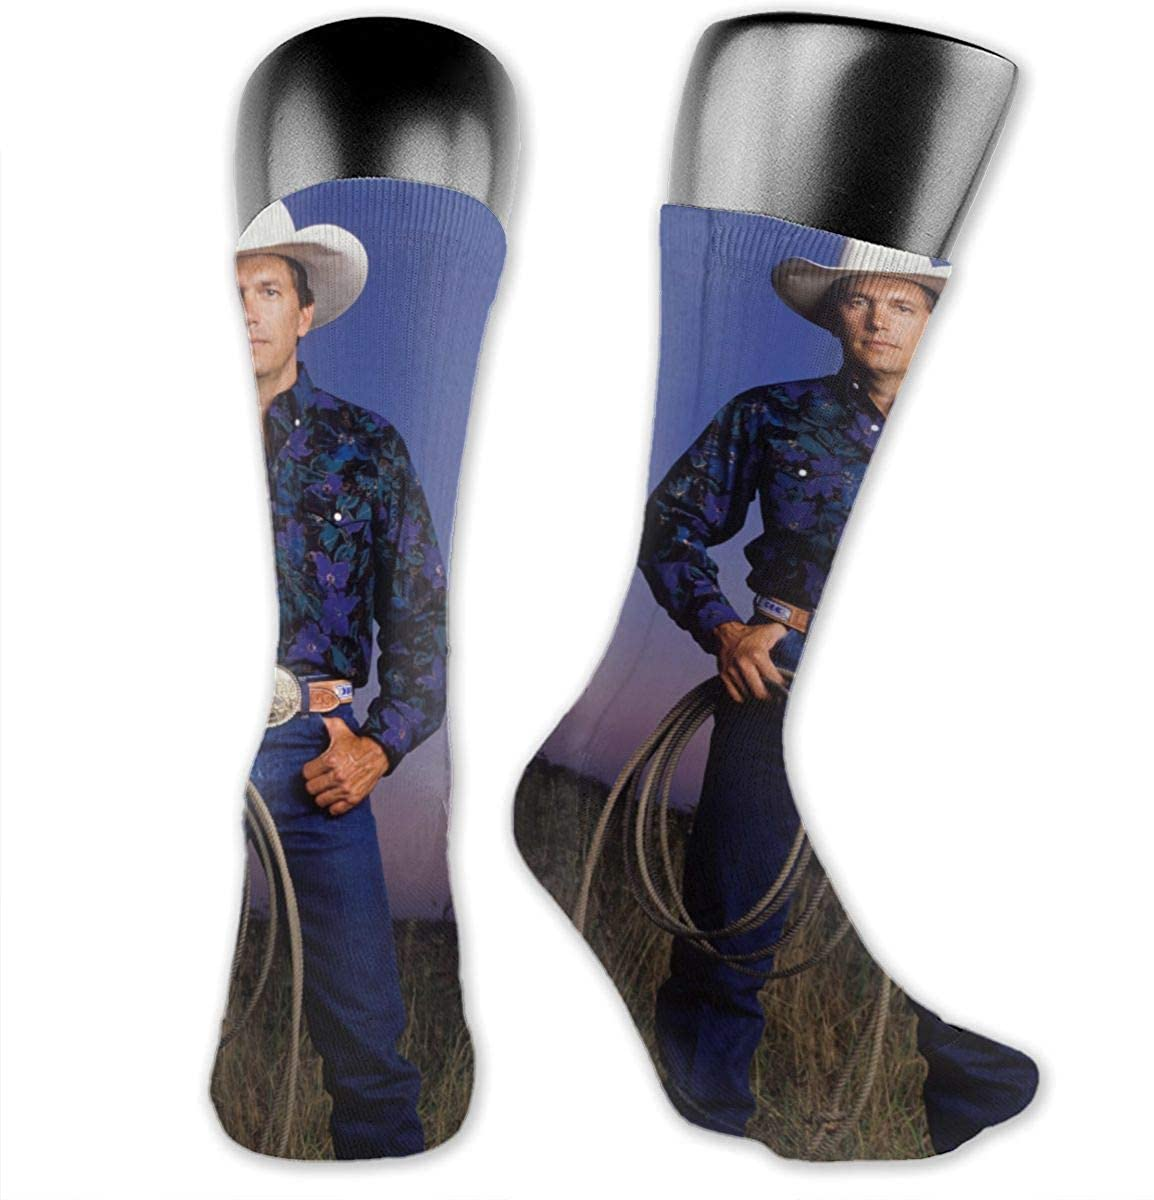 George Strait Strait Out Of The Box Medium Long Socks Dress Hose Novelty Short Anklet For Fitness